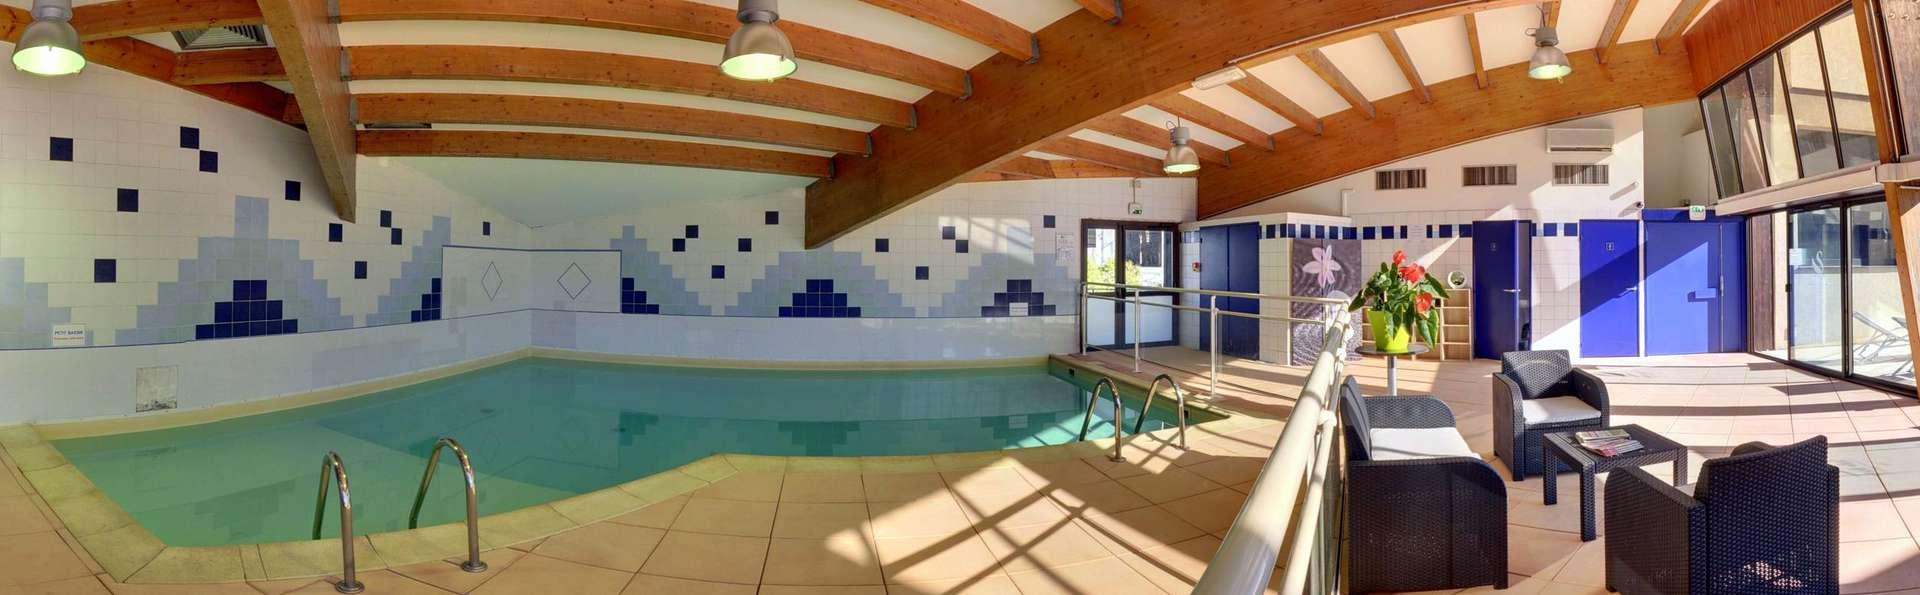 Week end montagne brian on partir de 72 for Briancon piscine